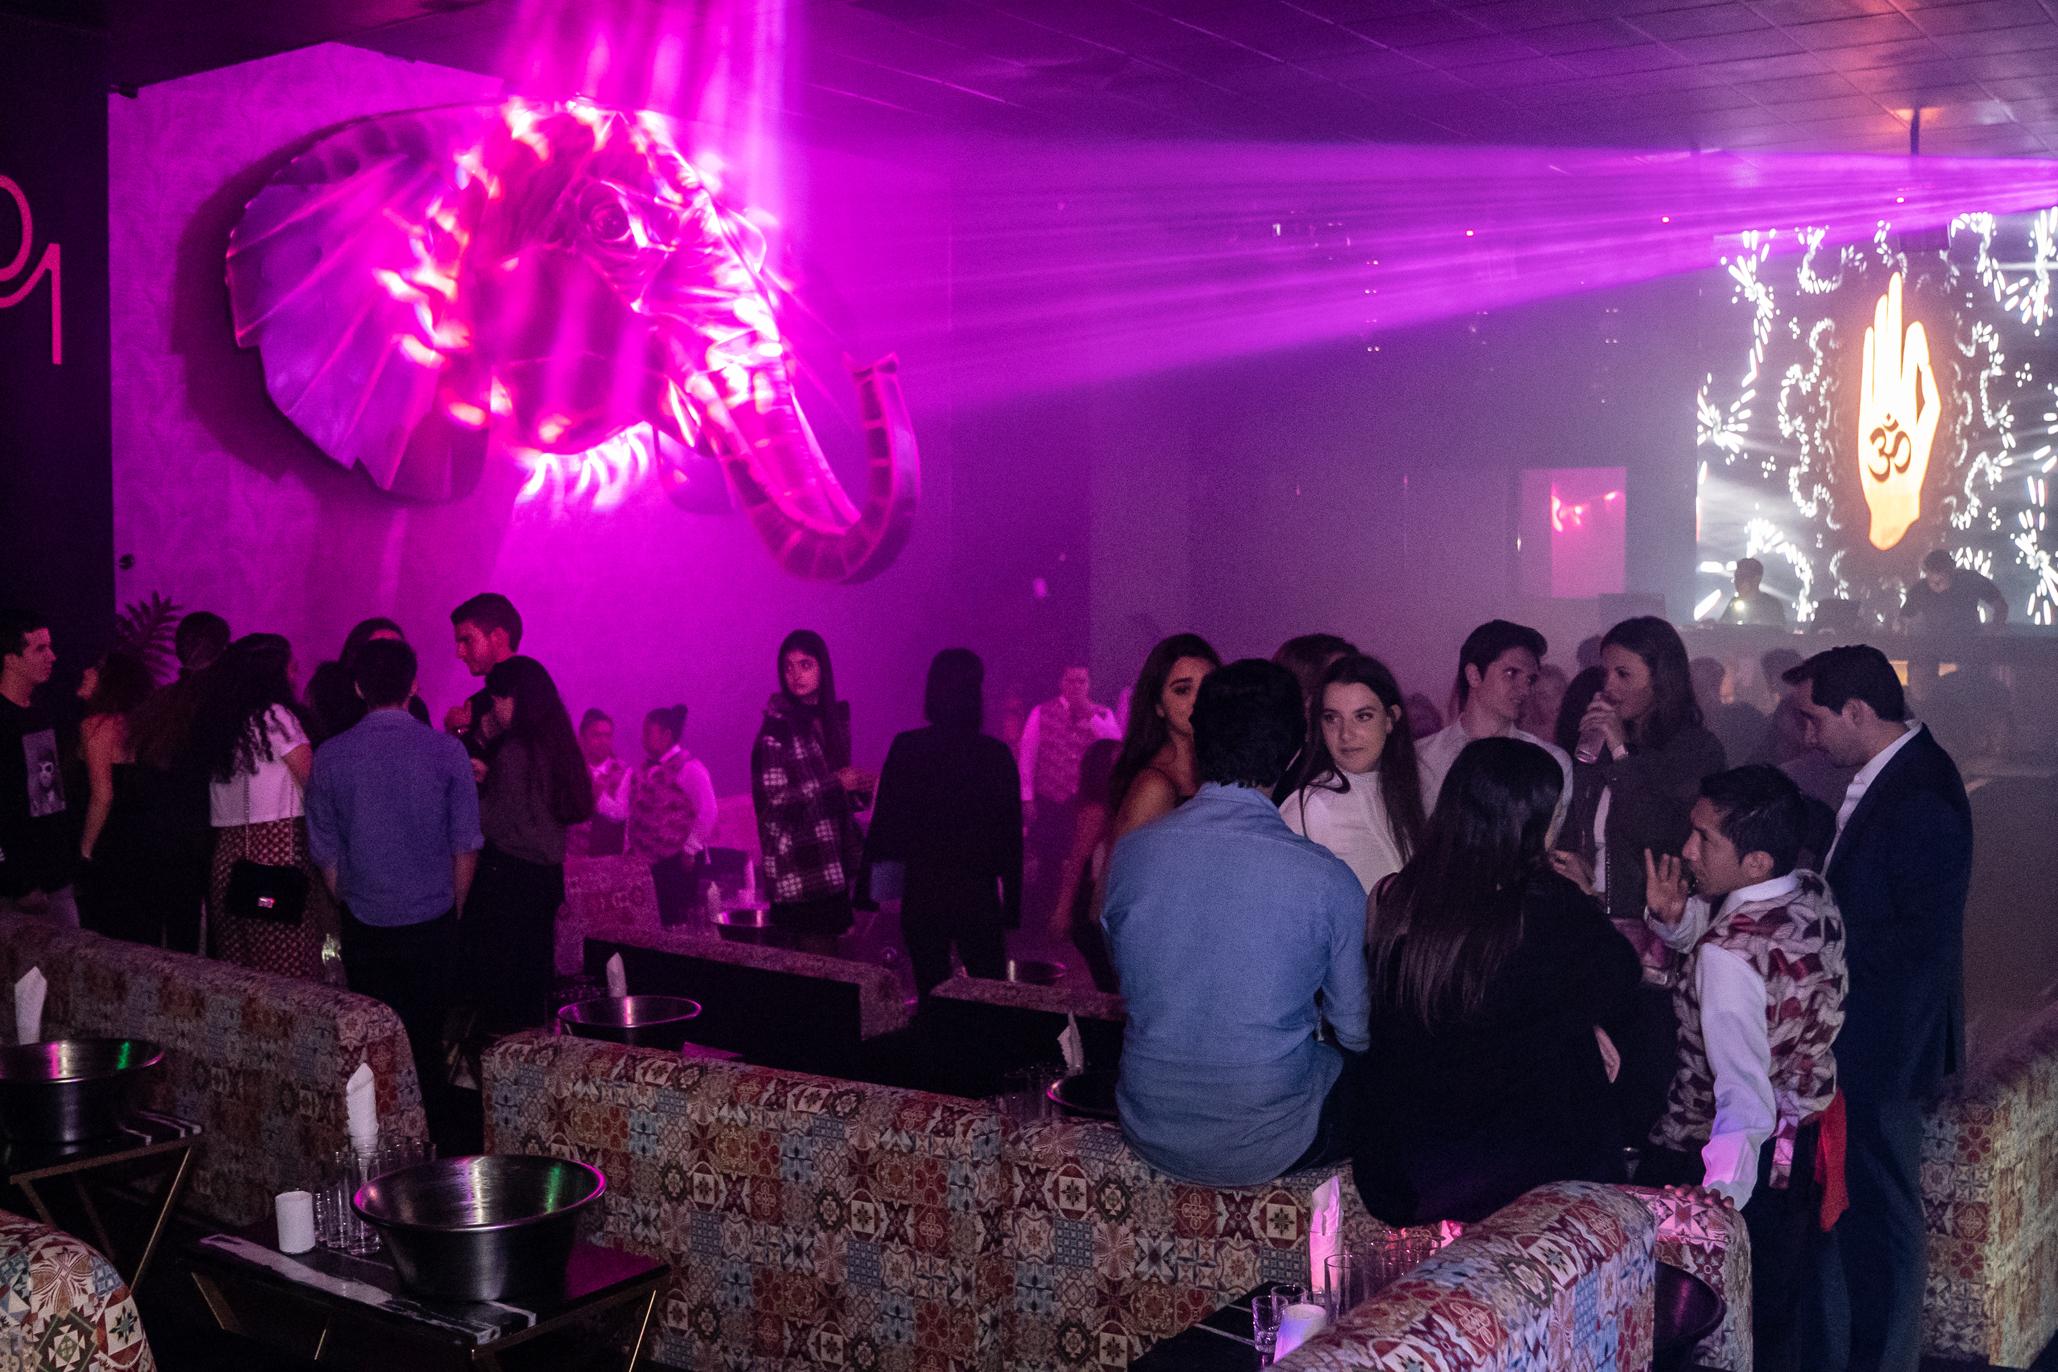 OM discotheque